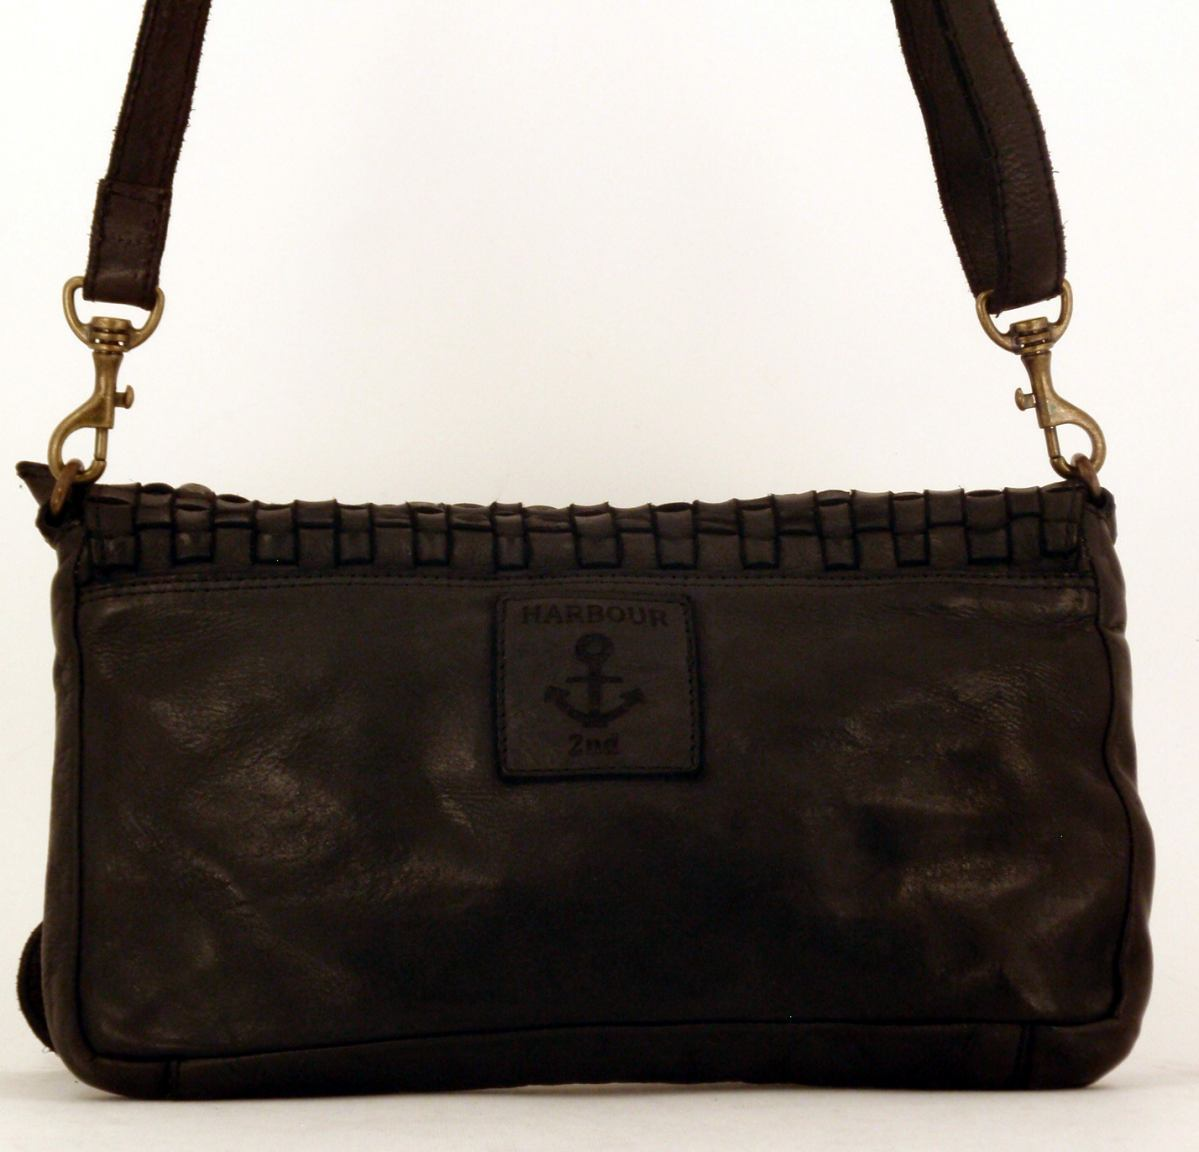 Überschlagtasche Loa Harbour2nd Leder Nieten Fuchsia